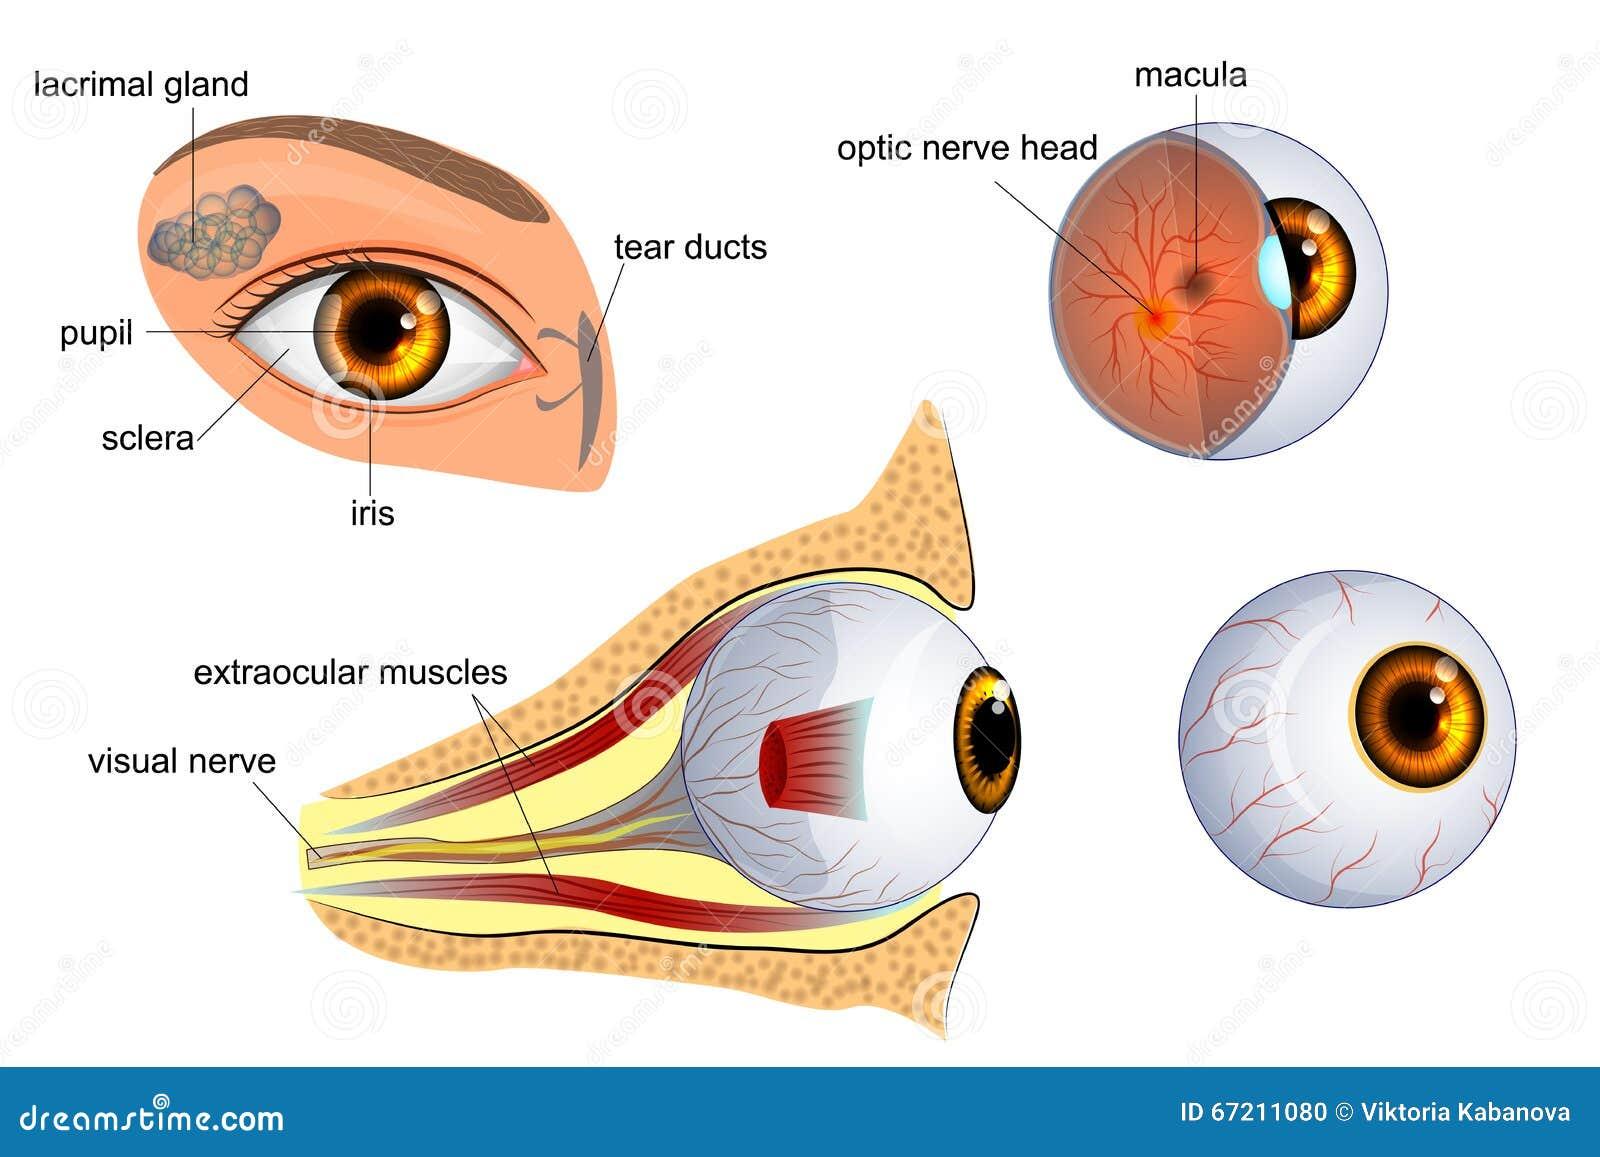 Cul de sac eye anatomy 8771024 - togelmaya.info